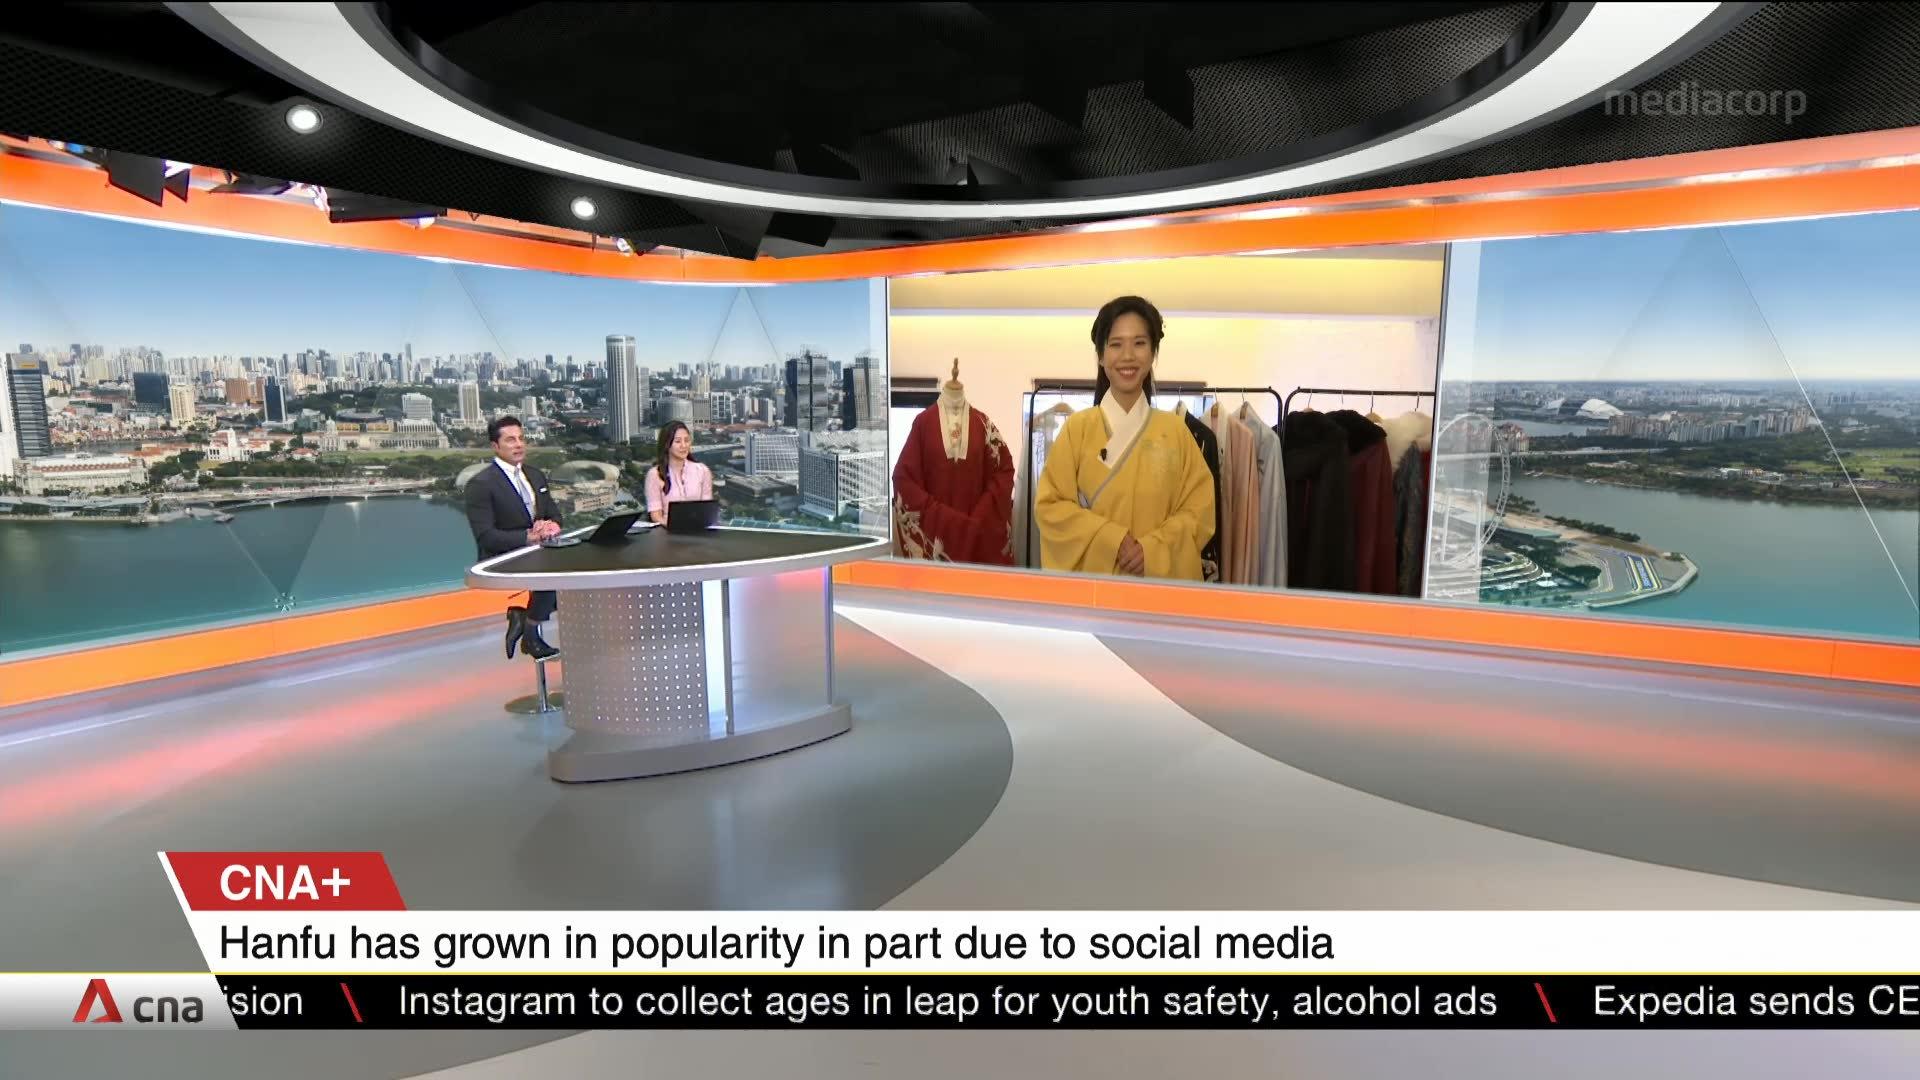 CNA+: China's Hanfu Trend